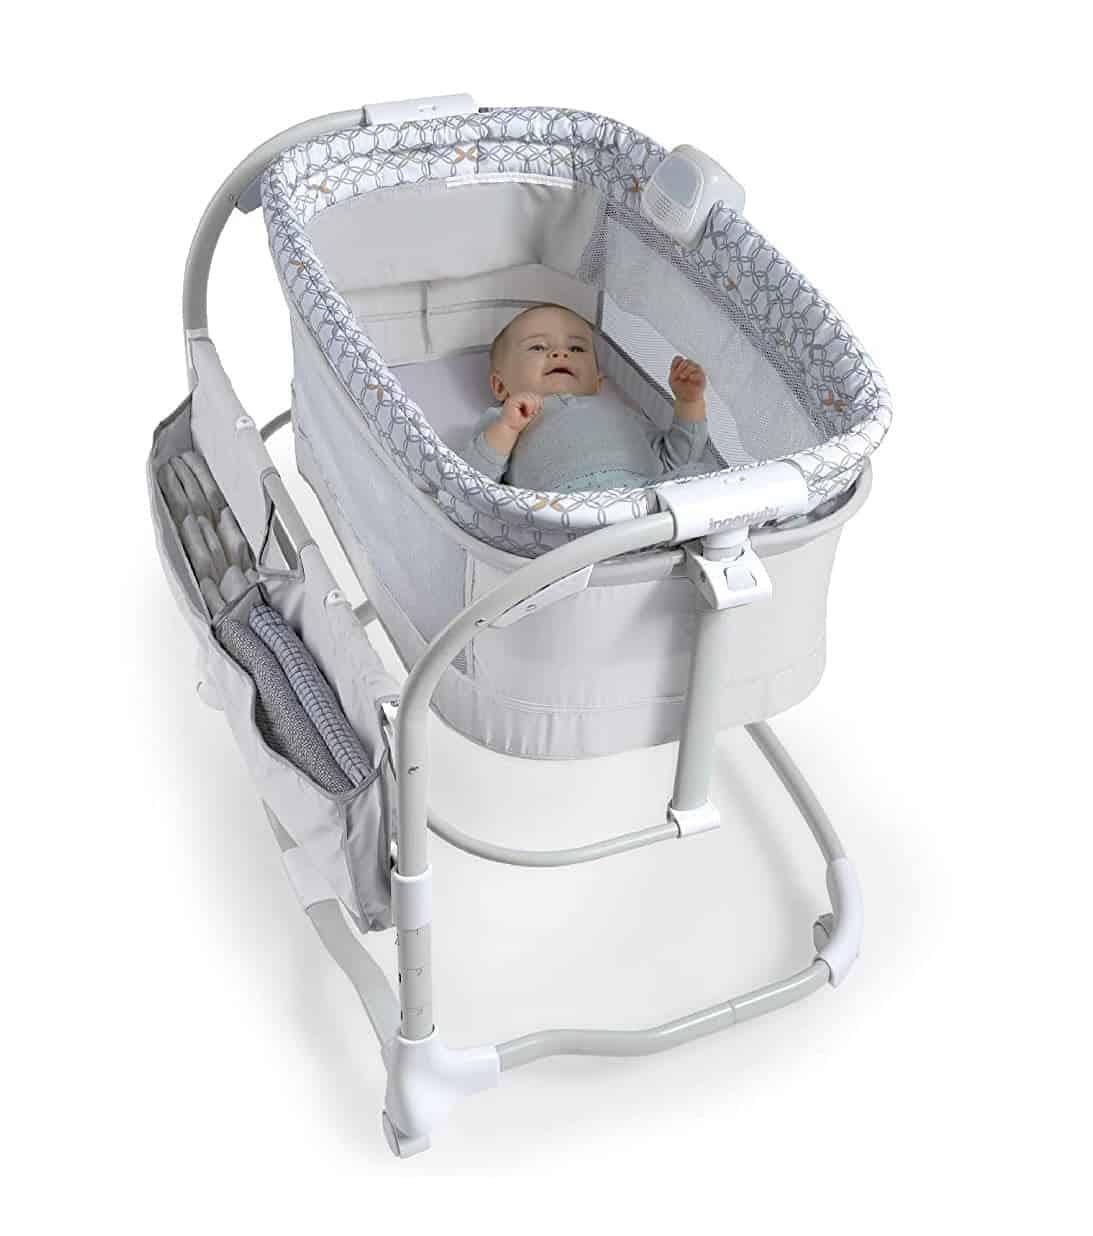 Baby sleeping in Ingenuity Dream and Grow Bedside Bassinet